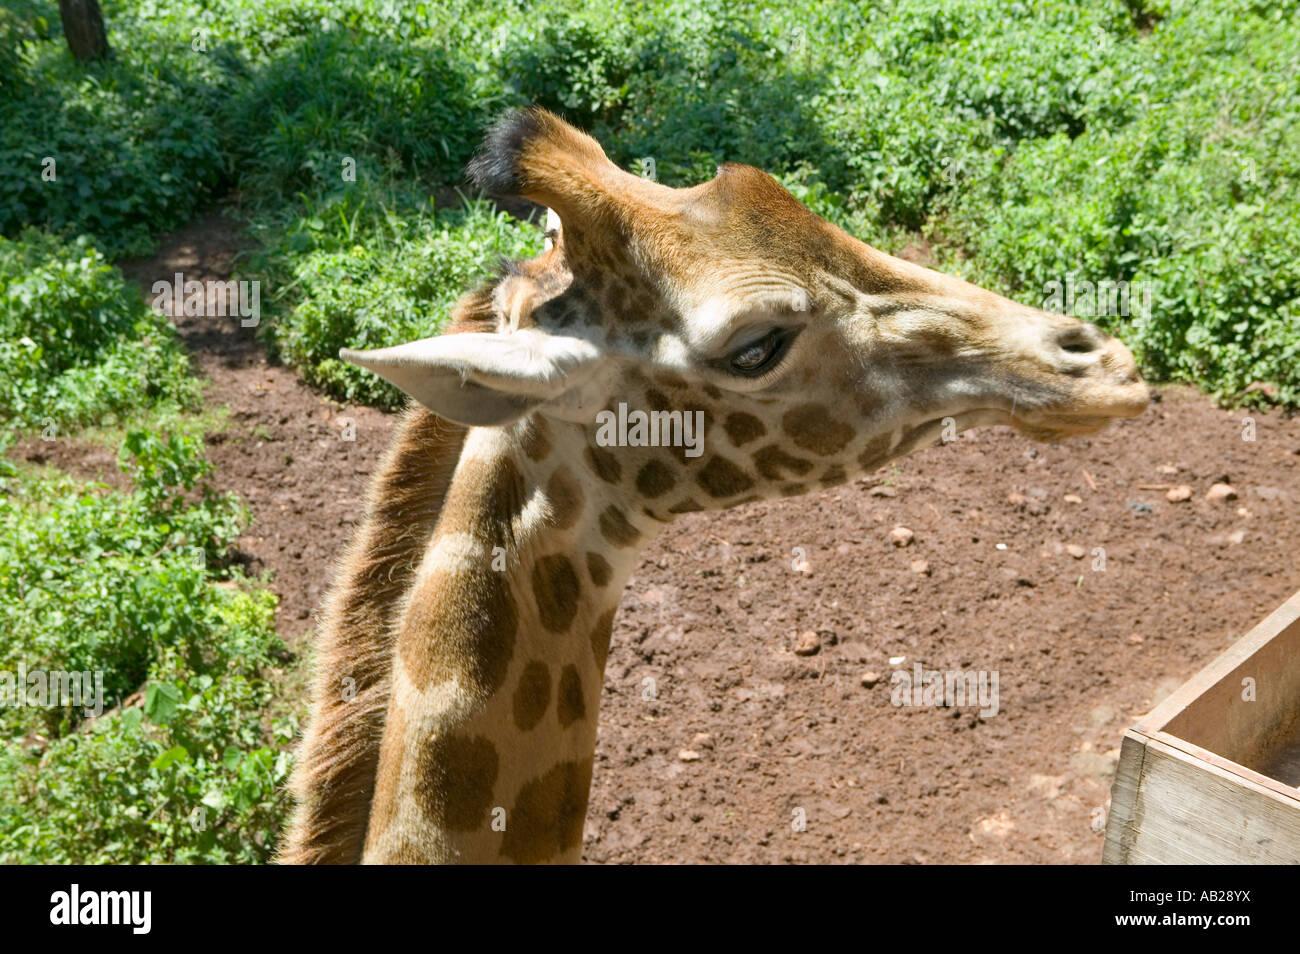 Hand feeds Rothschild giraffe s head at the African Fund for Endangered Wildlife Giraffe Center near Nairobi National - Stock Image